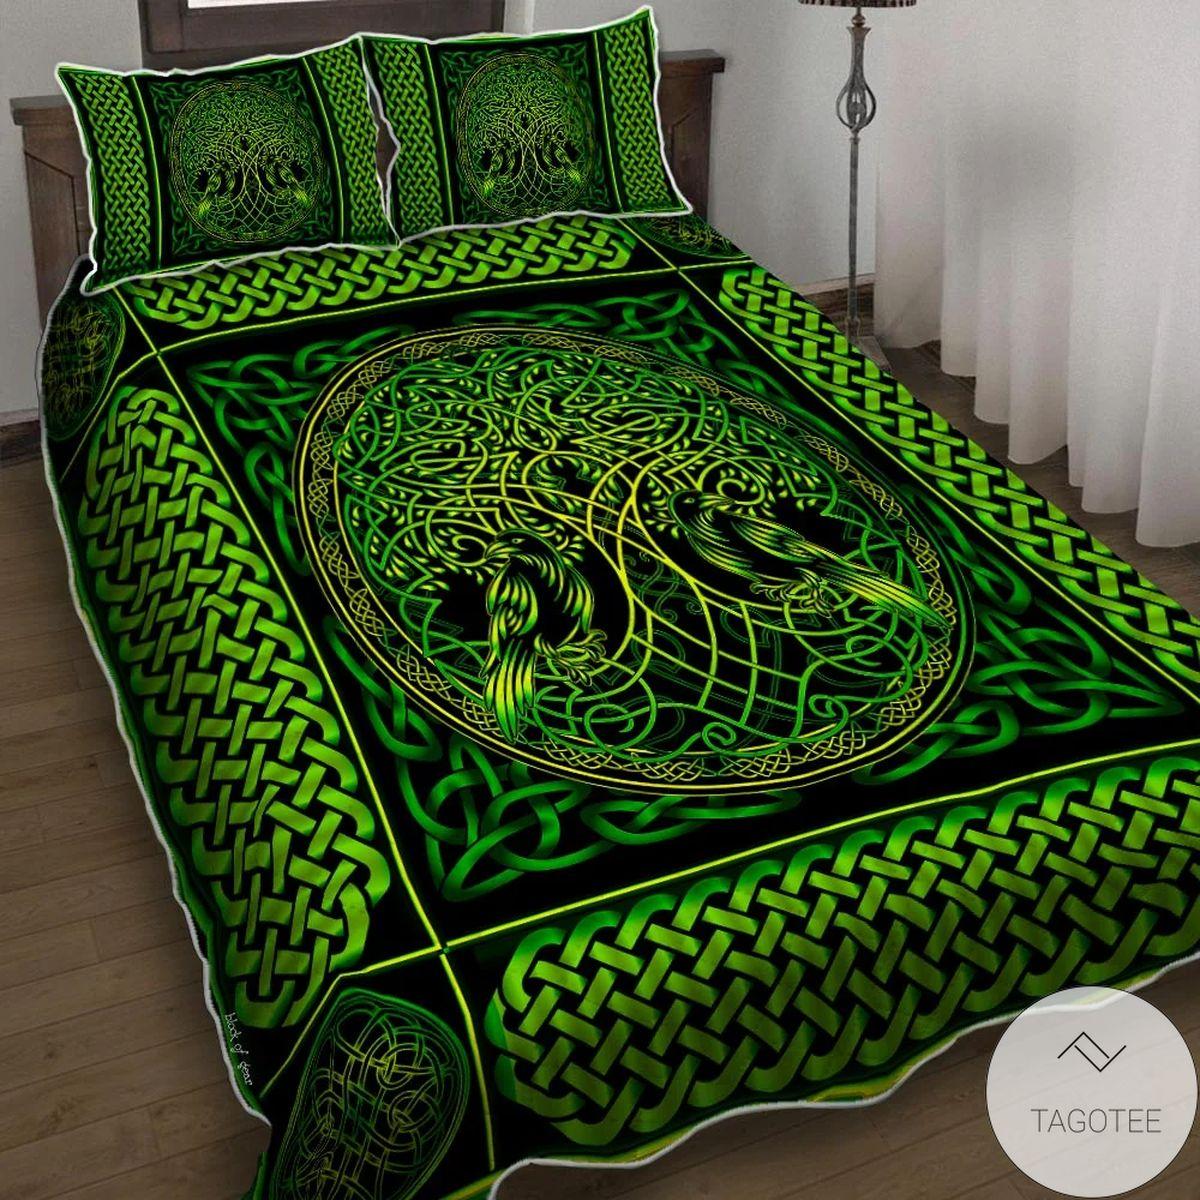 Yggdrasil Symbol With Raven Green Quilt Bedding Set